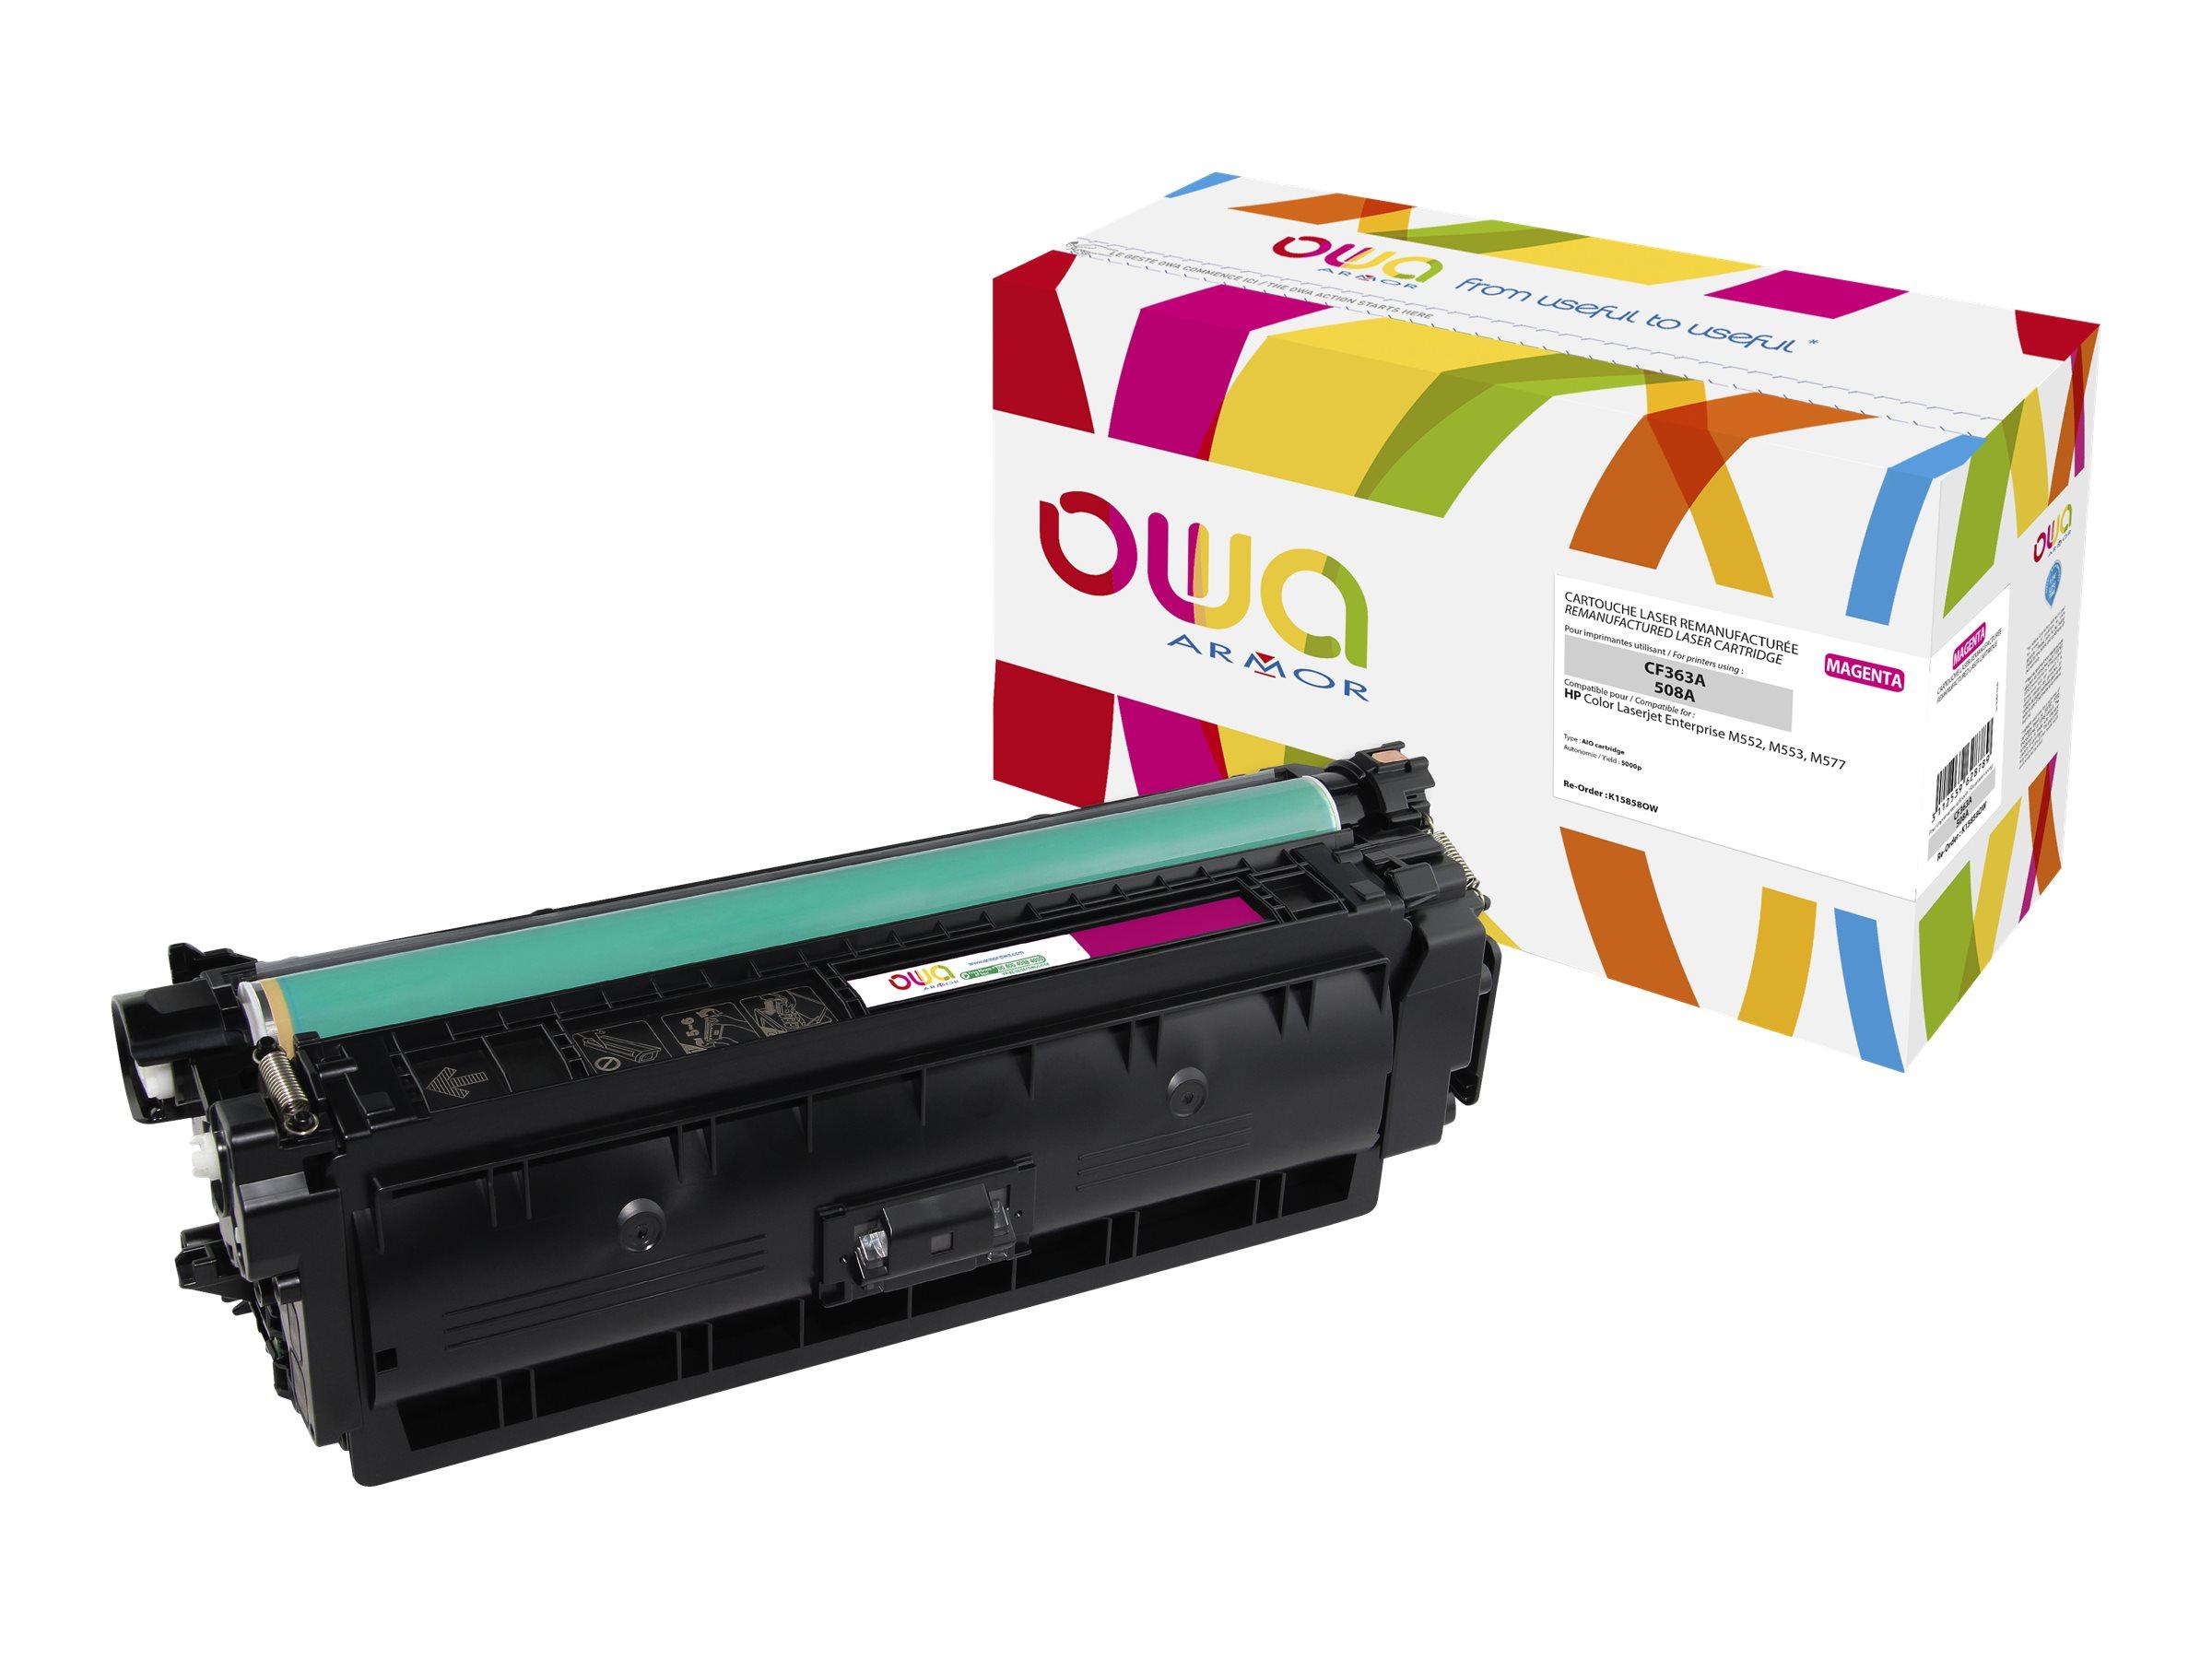 HP 508A - remanufacturé Owa K15858OW - magenta - cartouche laser